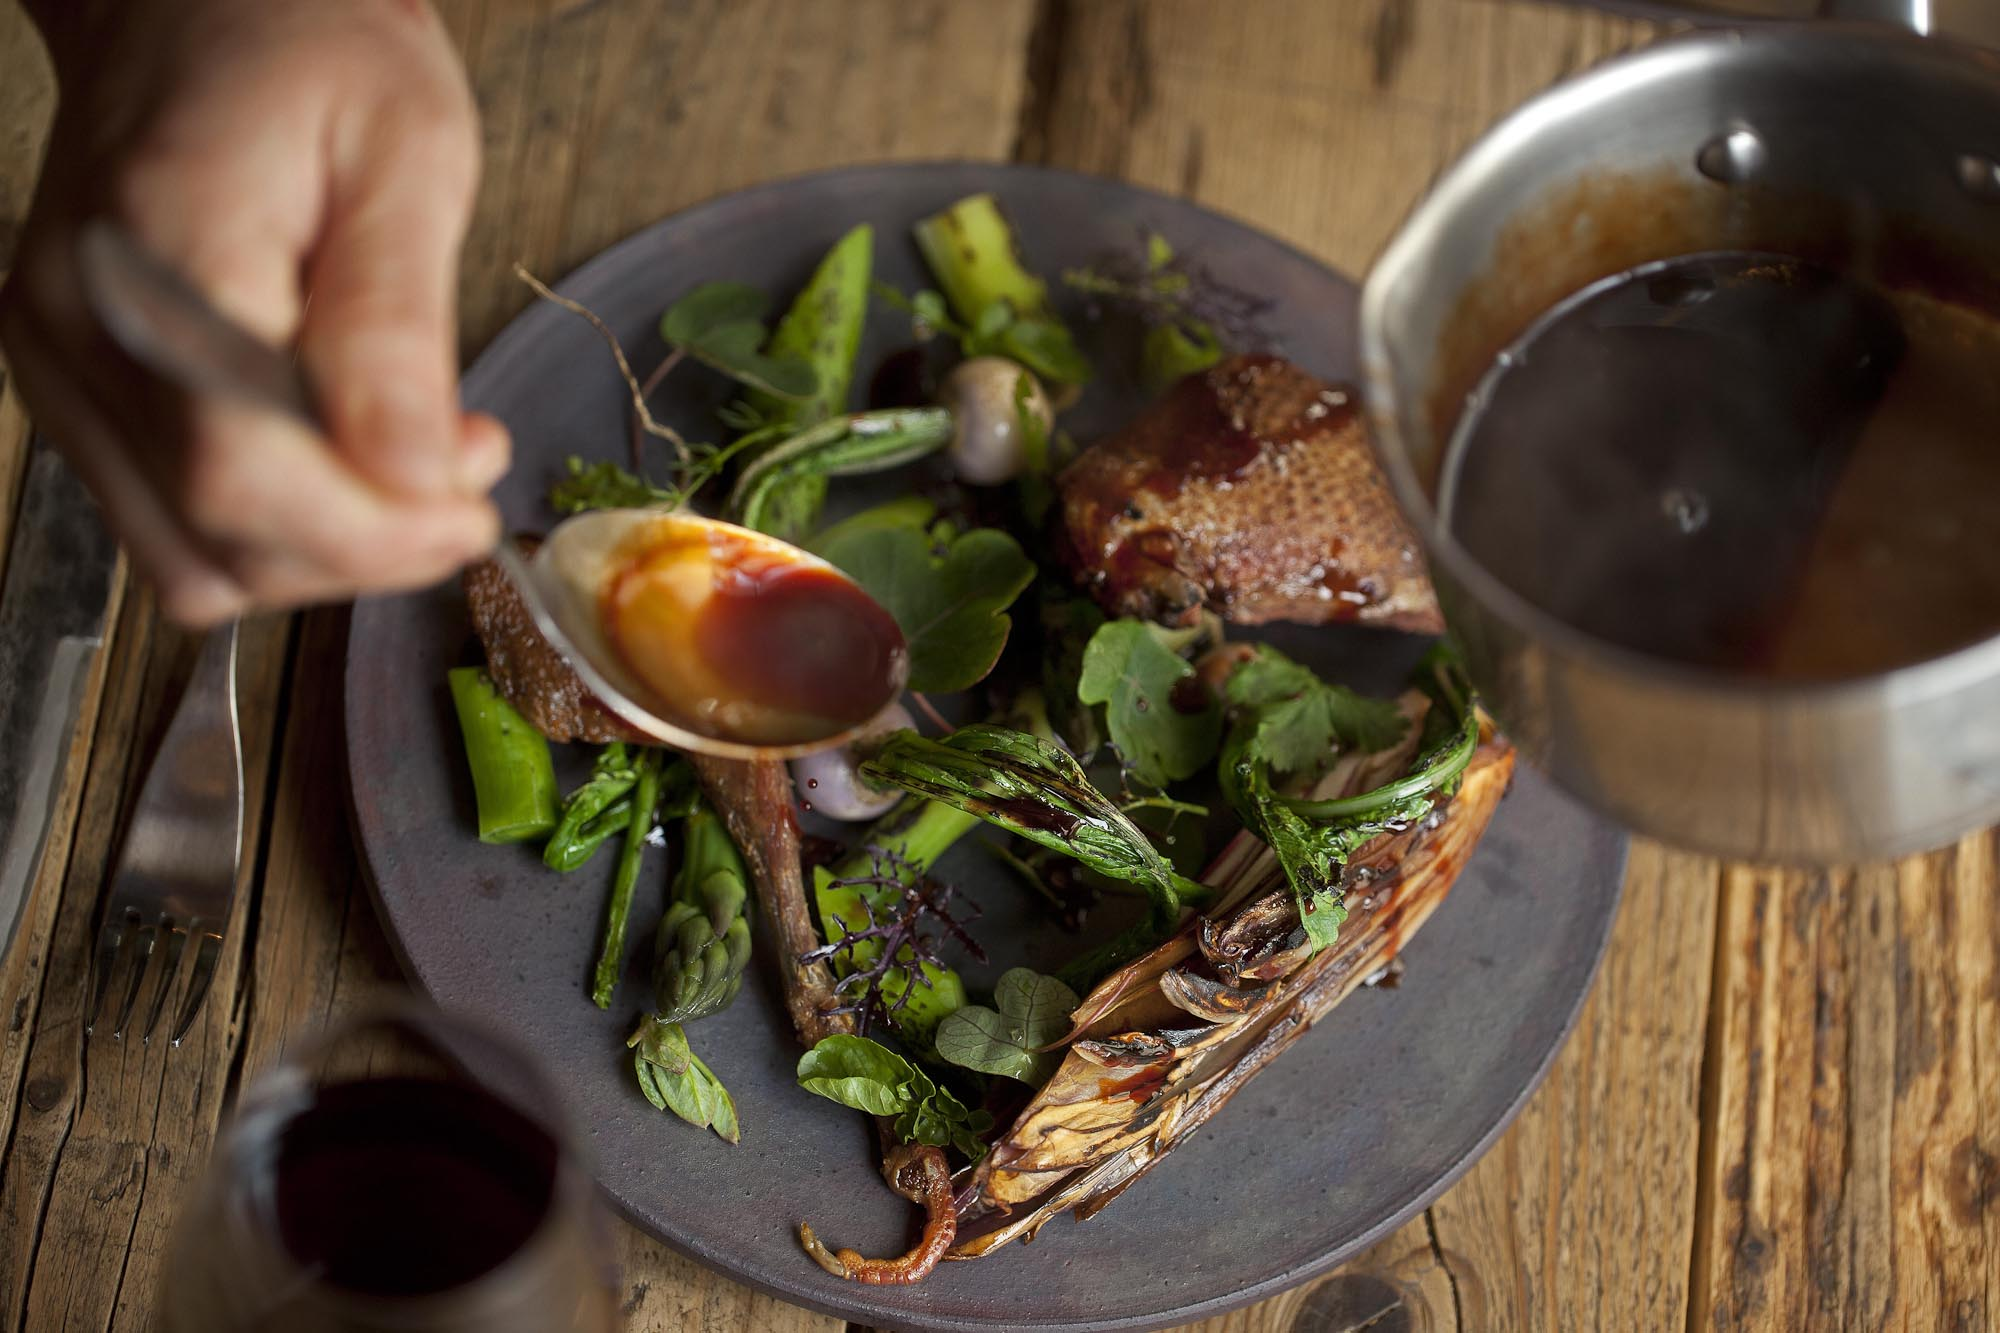 Taku Sekine, Dersou. Pigeon, green asparagus, turnips, herbs, stew juice, trevisse salad.